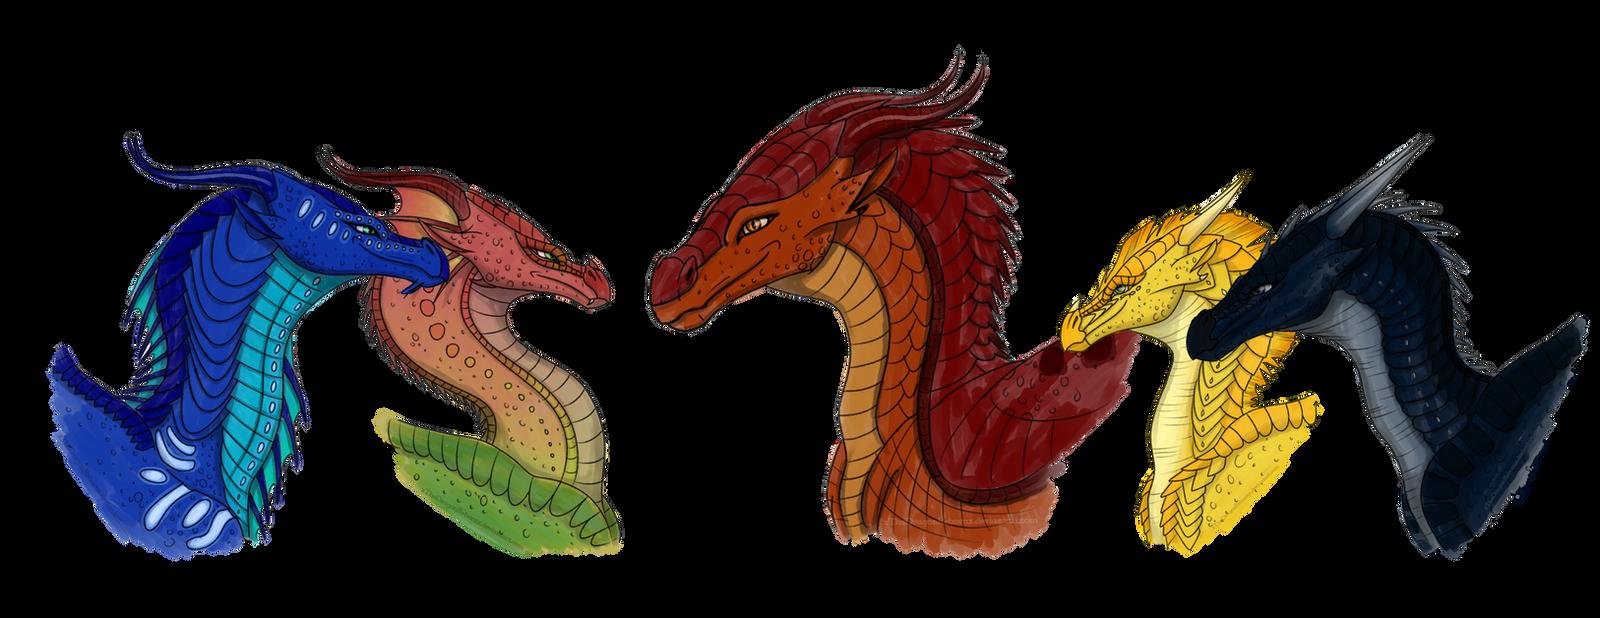 The Dragonets of Destiny by xTheDragonRebornx on DeviantArt